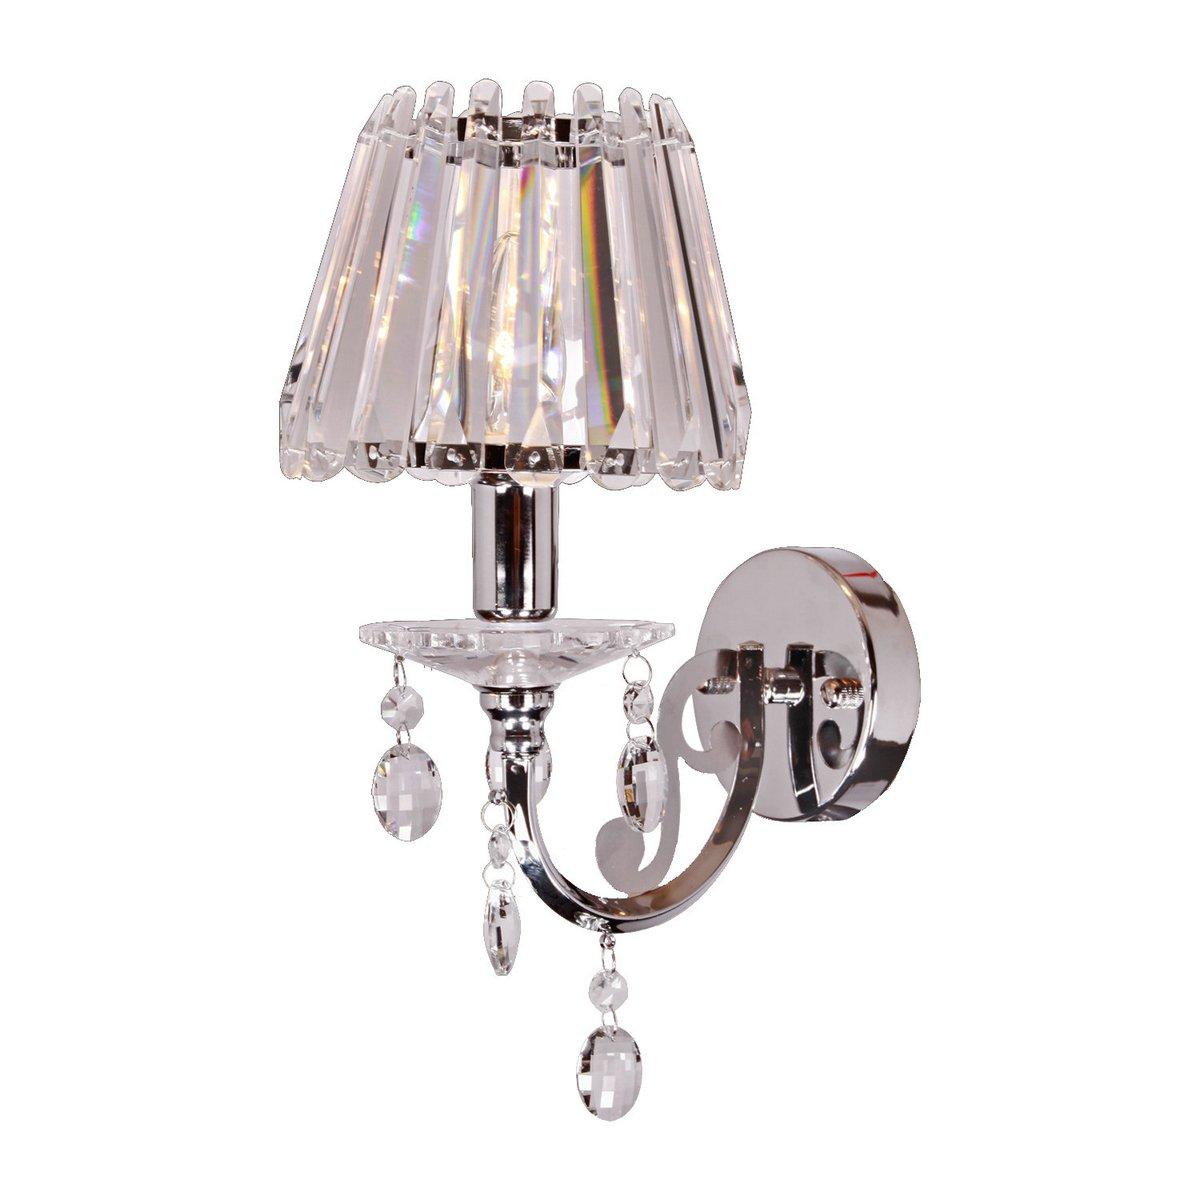 DINGGU™ Modern Luxury 1 Light Crystal Wall Lamp Bedside Light Fixtures For Living Room,Bedroom,Hallway